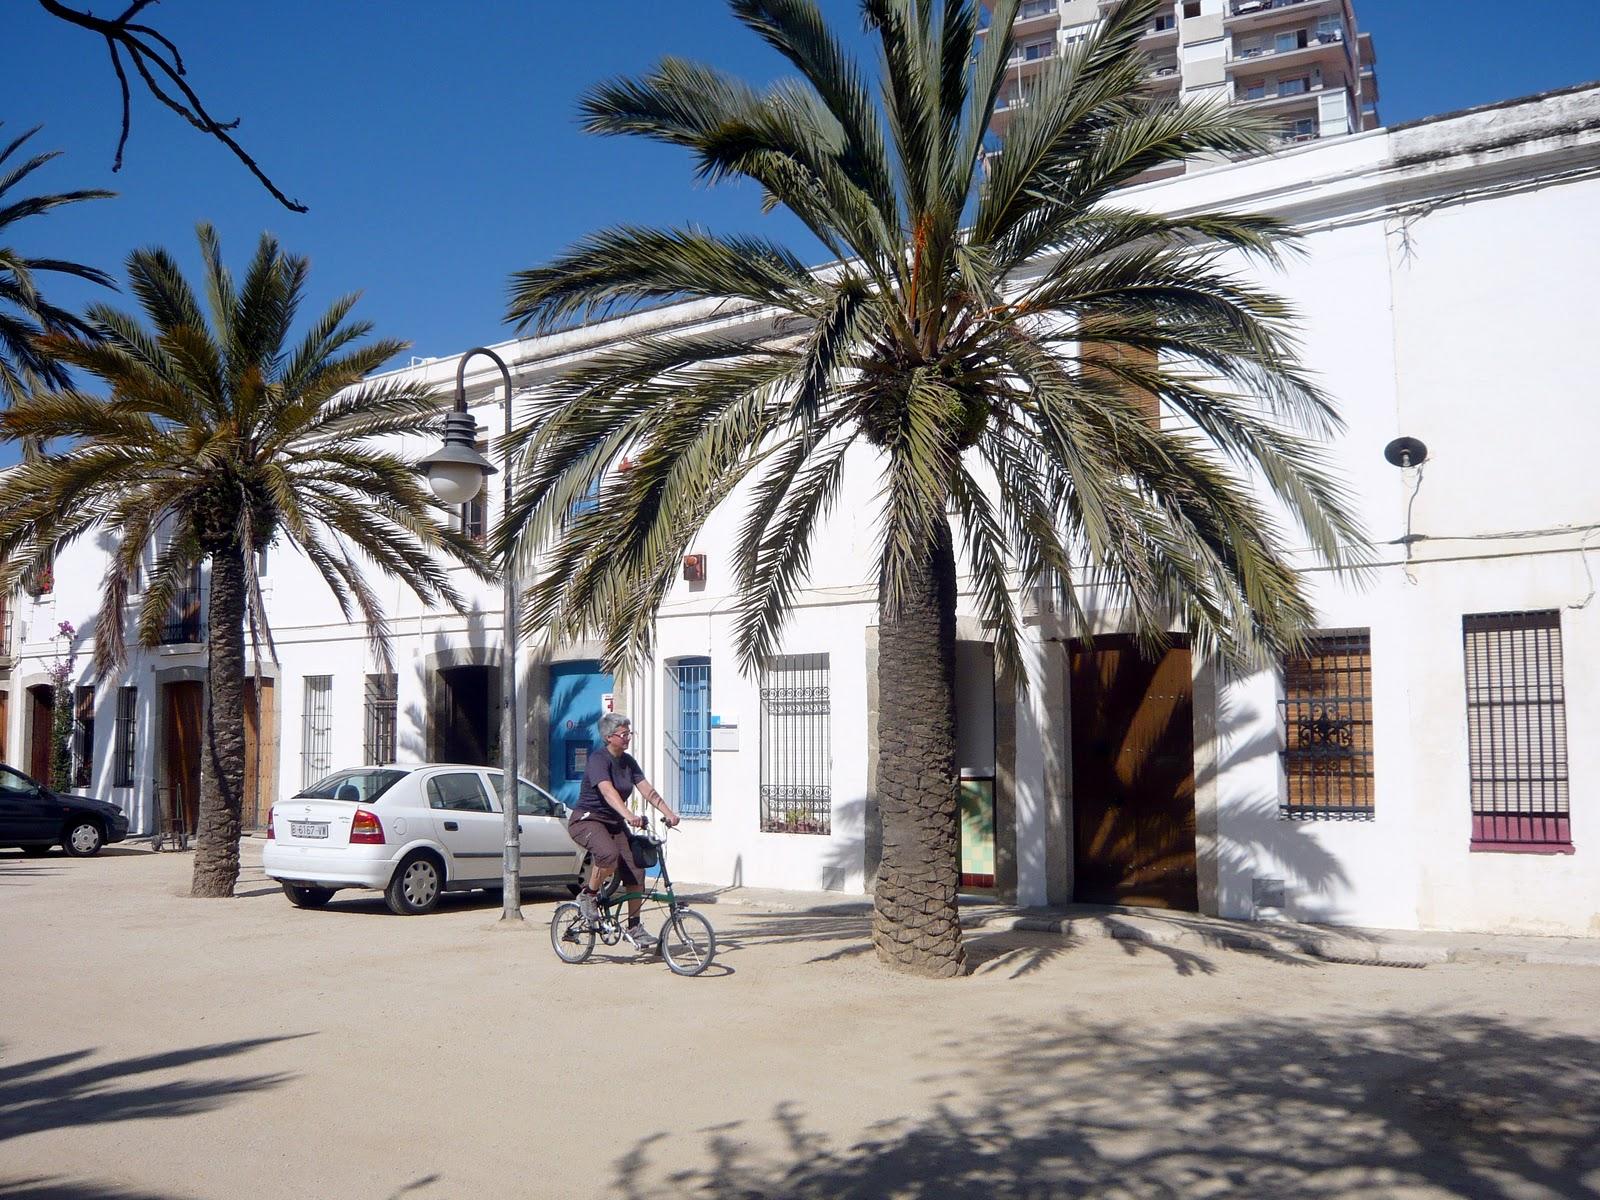 Tourmalet seguint el litoral nord enll fins arenys for Piscina municipal mataro